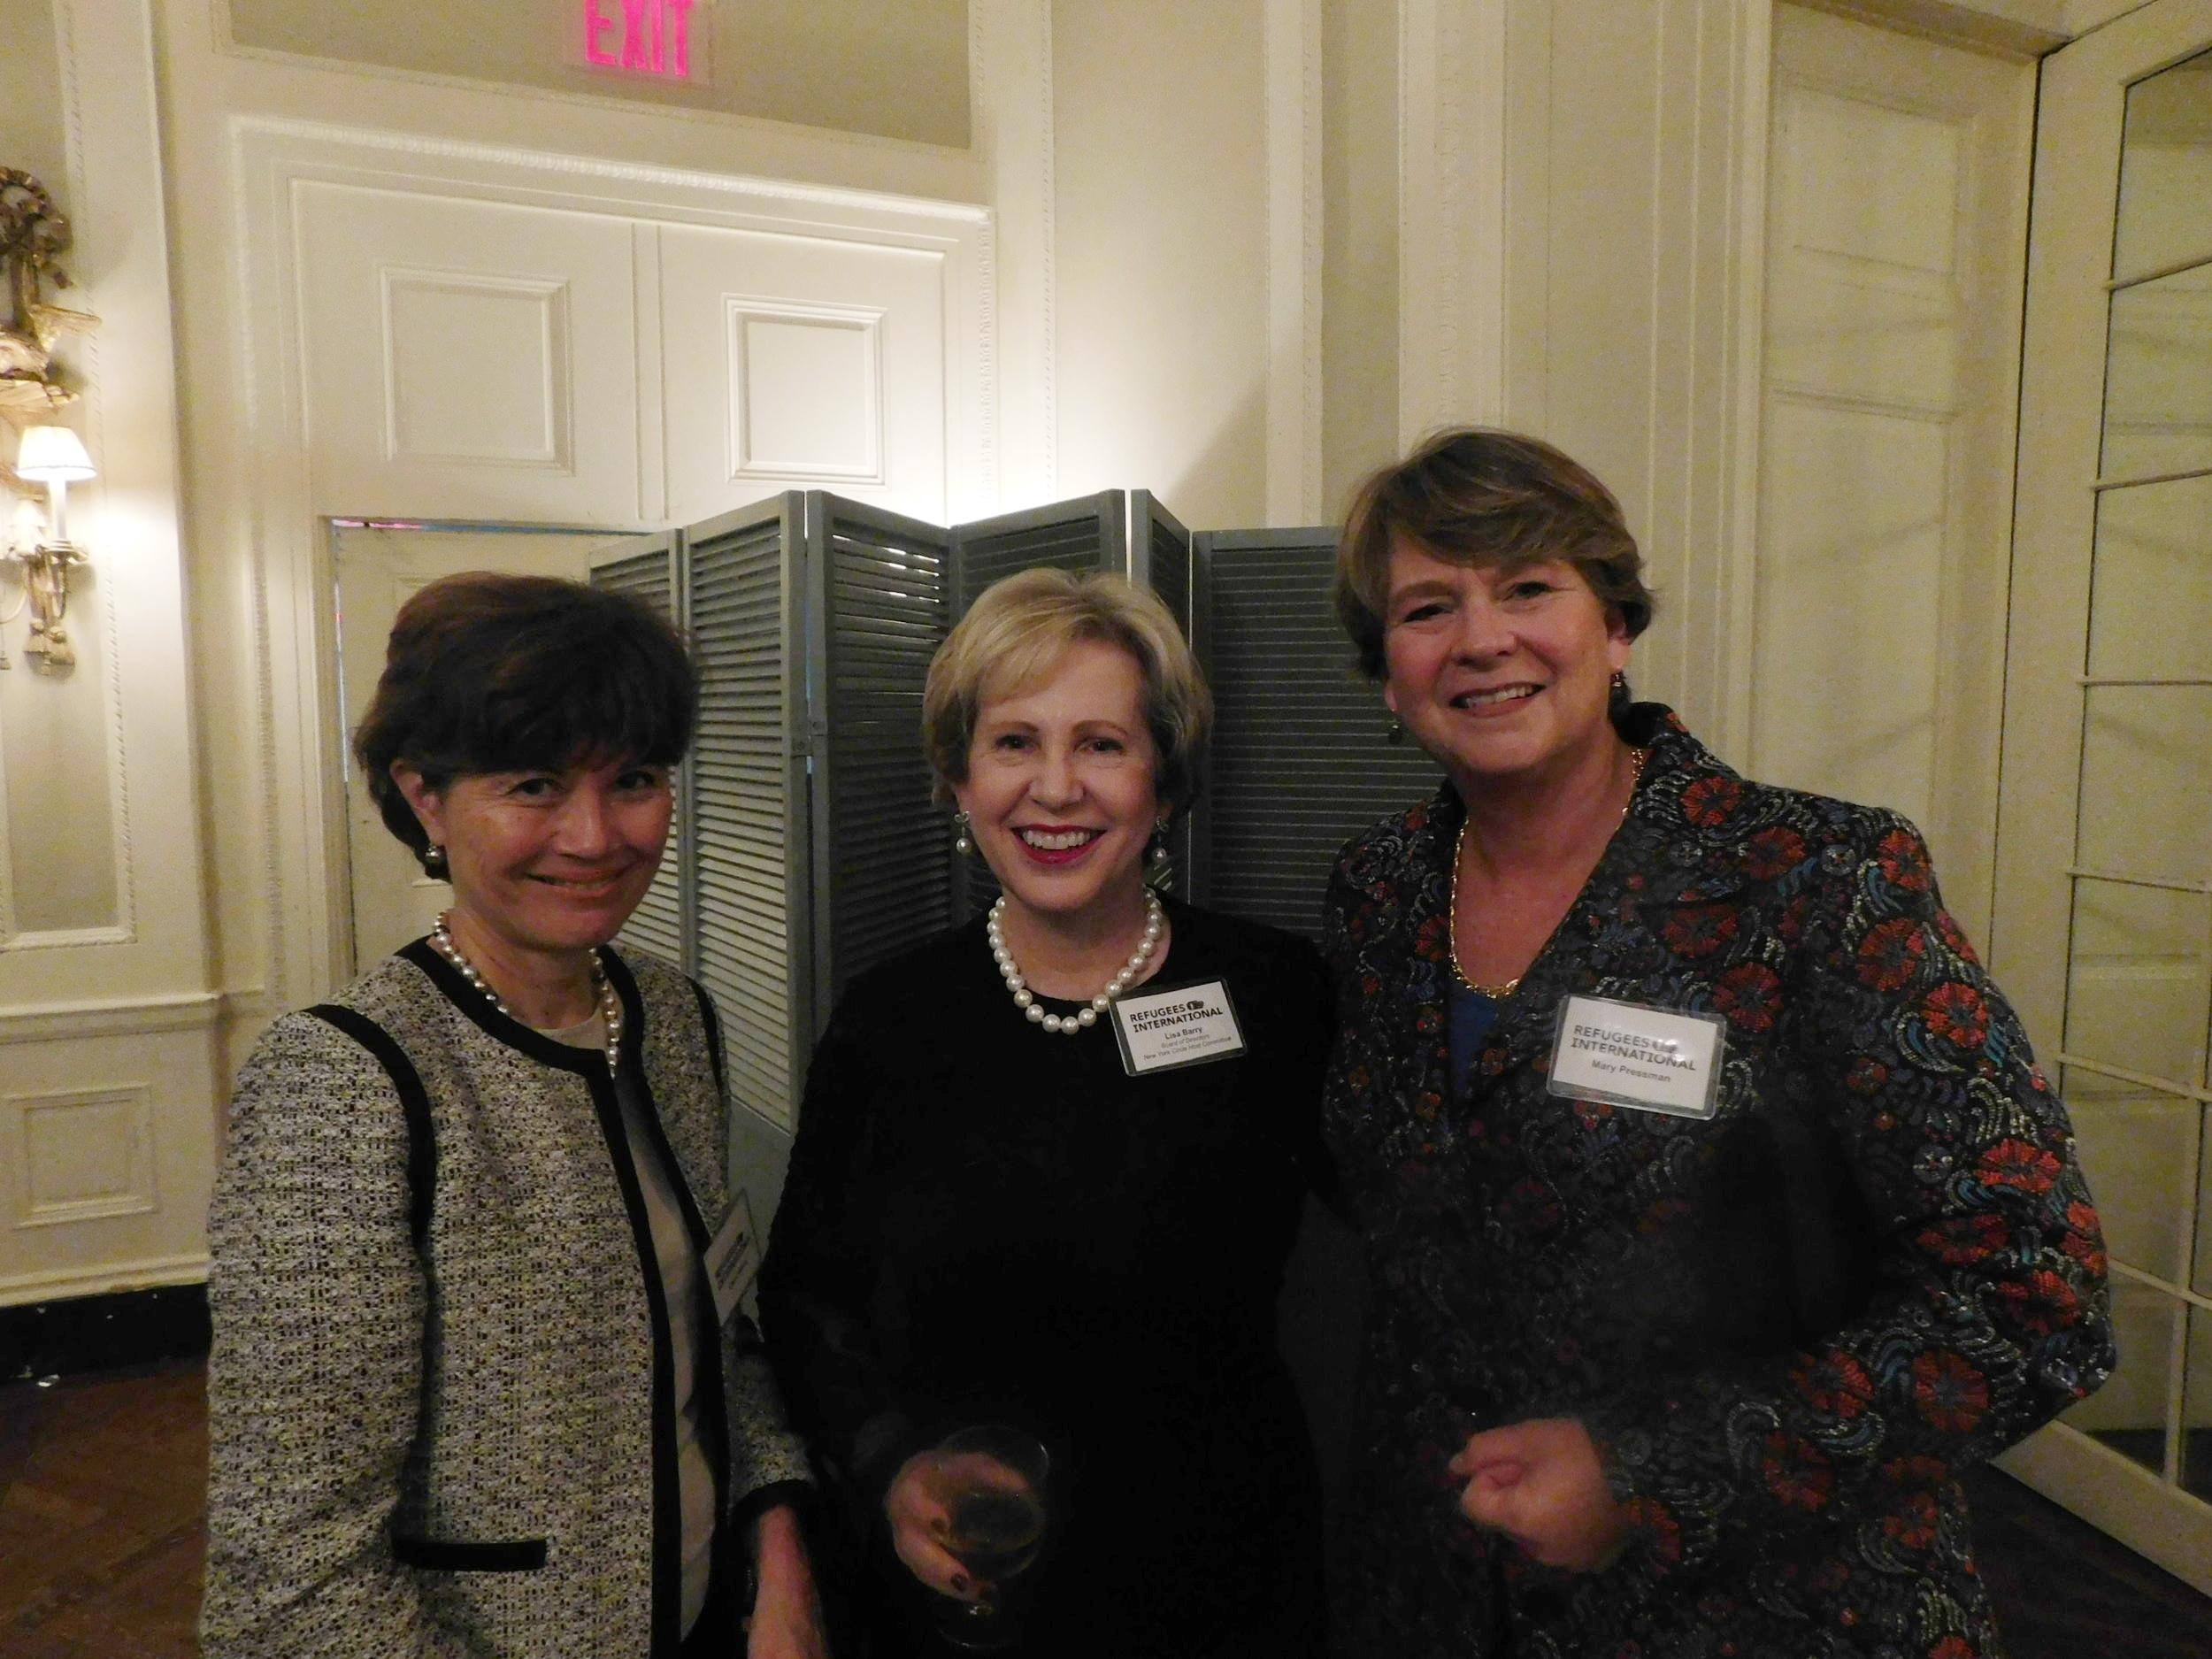 Carol Rattray, RI Board member Lisa Barry, and Mary Pressman